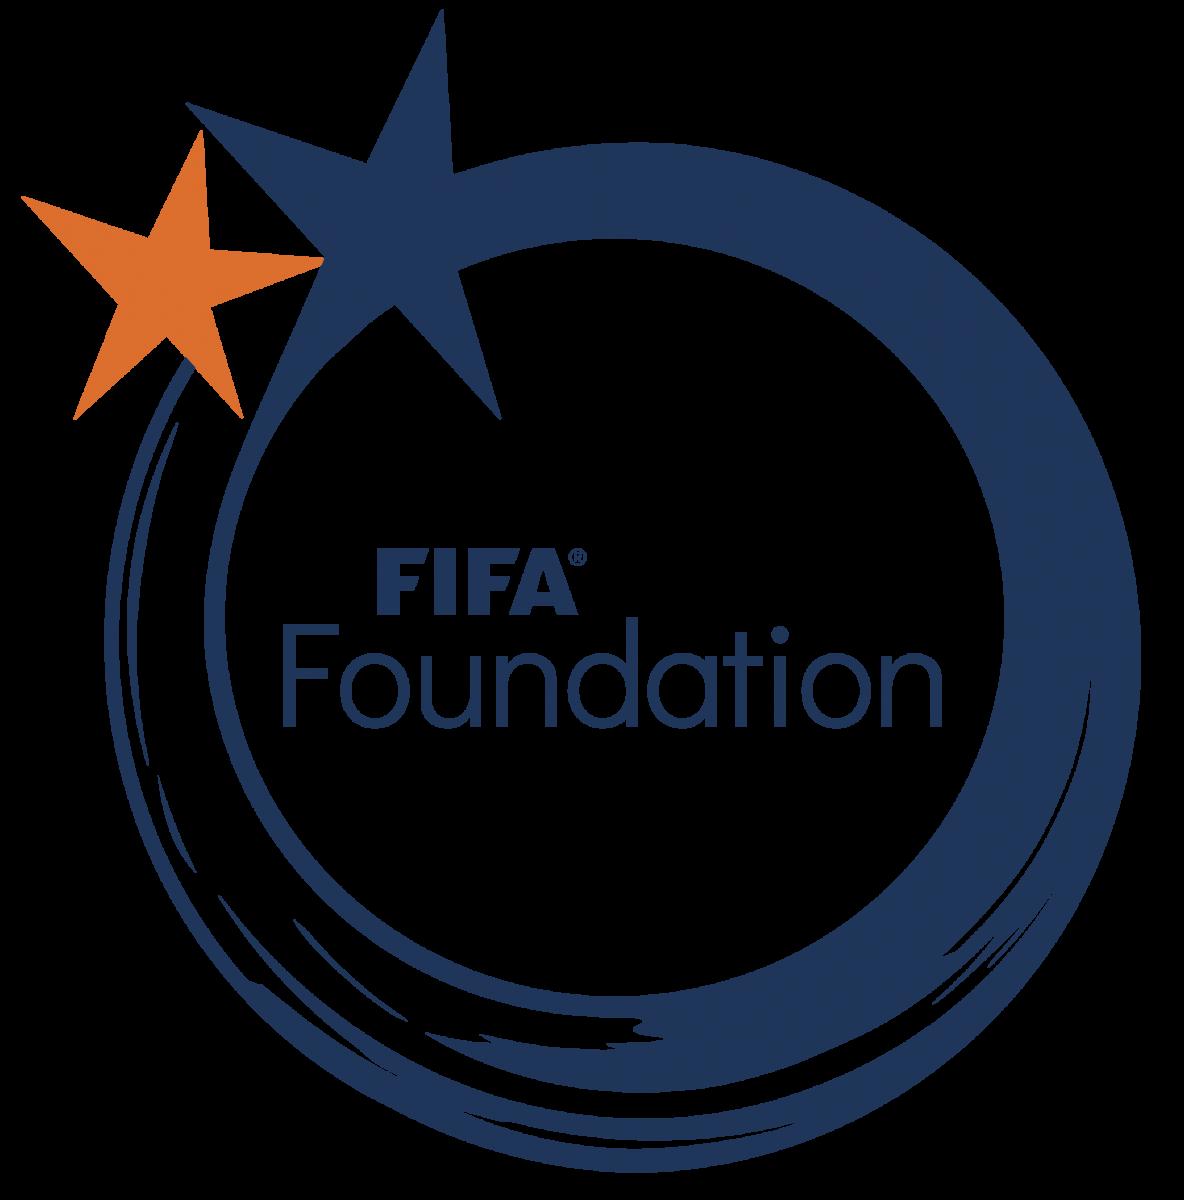 Angaza fifa foundation